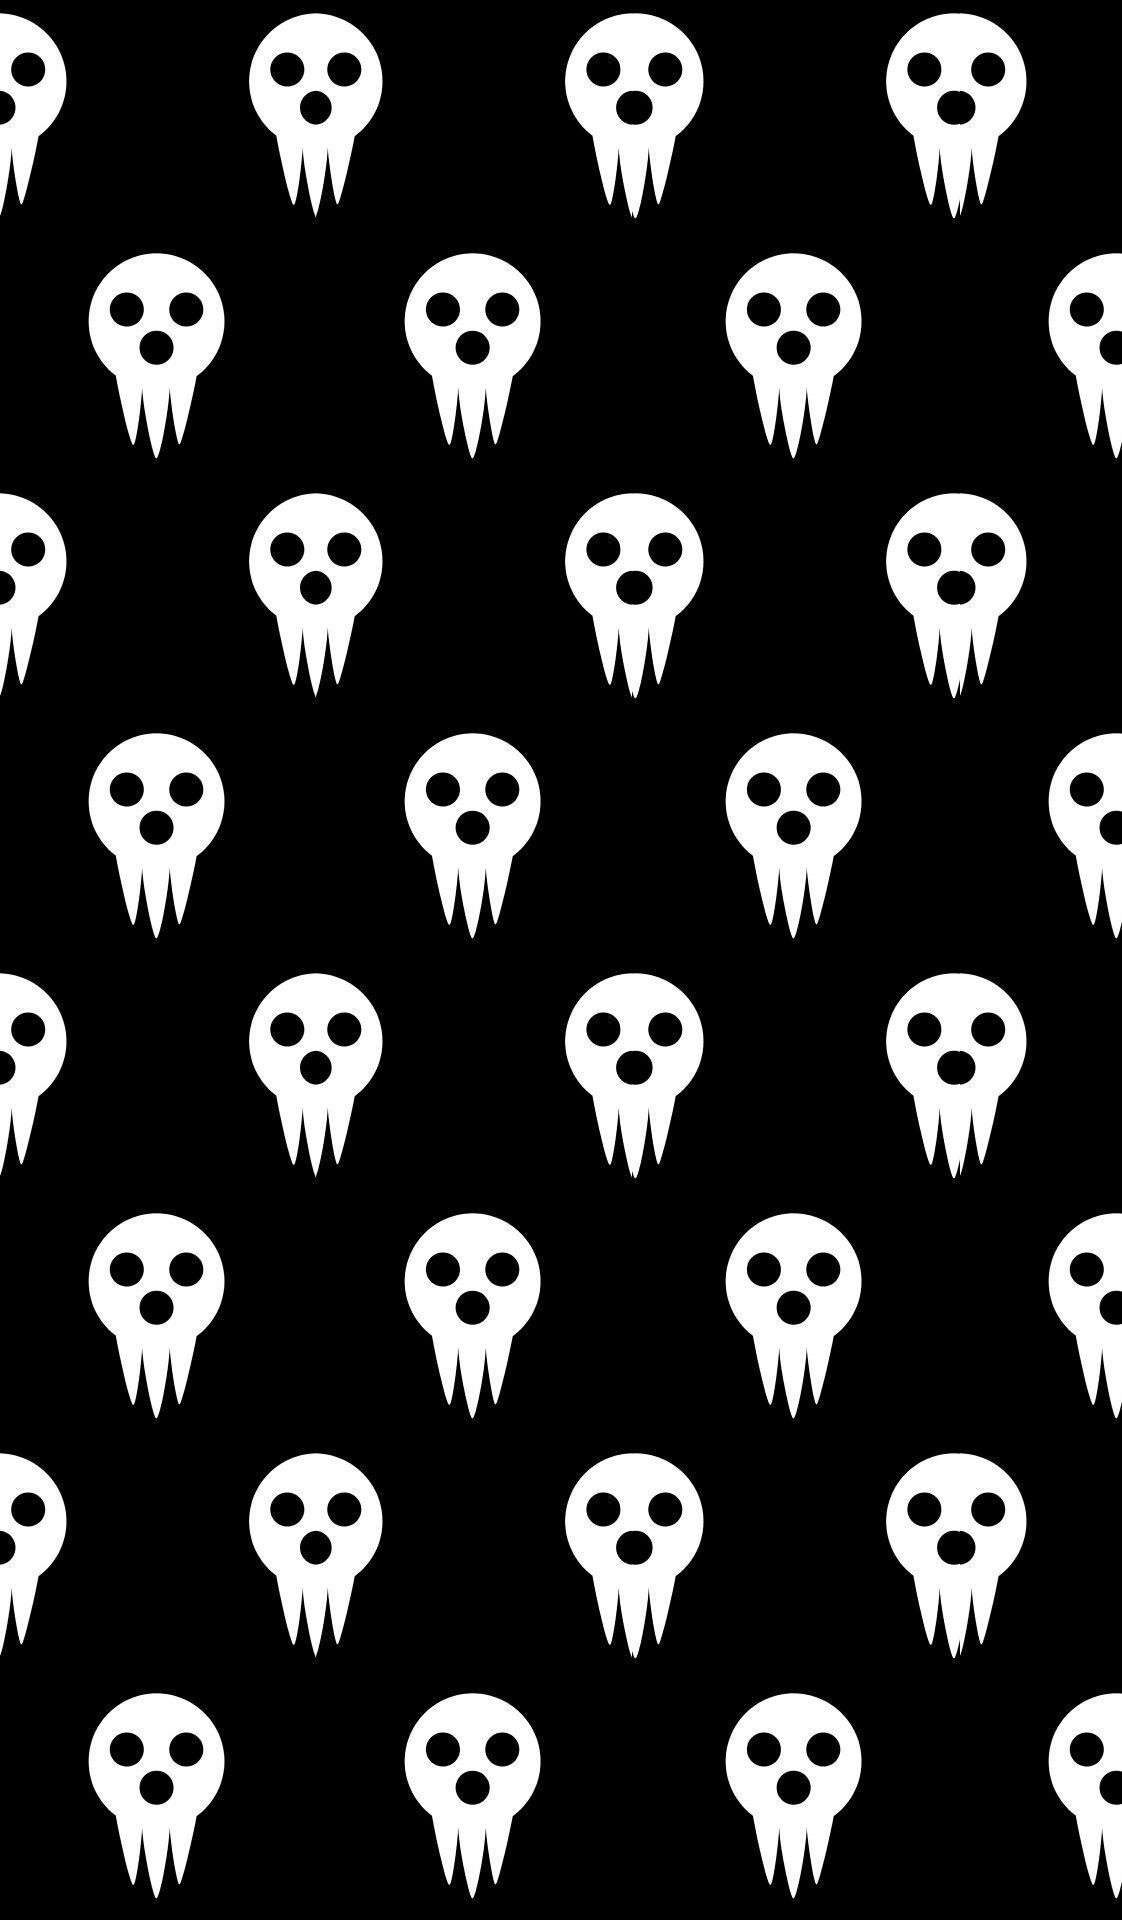 Death Eater Aesthetic Desktop Wallpapers On Wallpaperdog